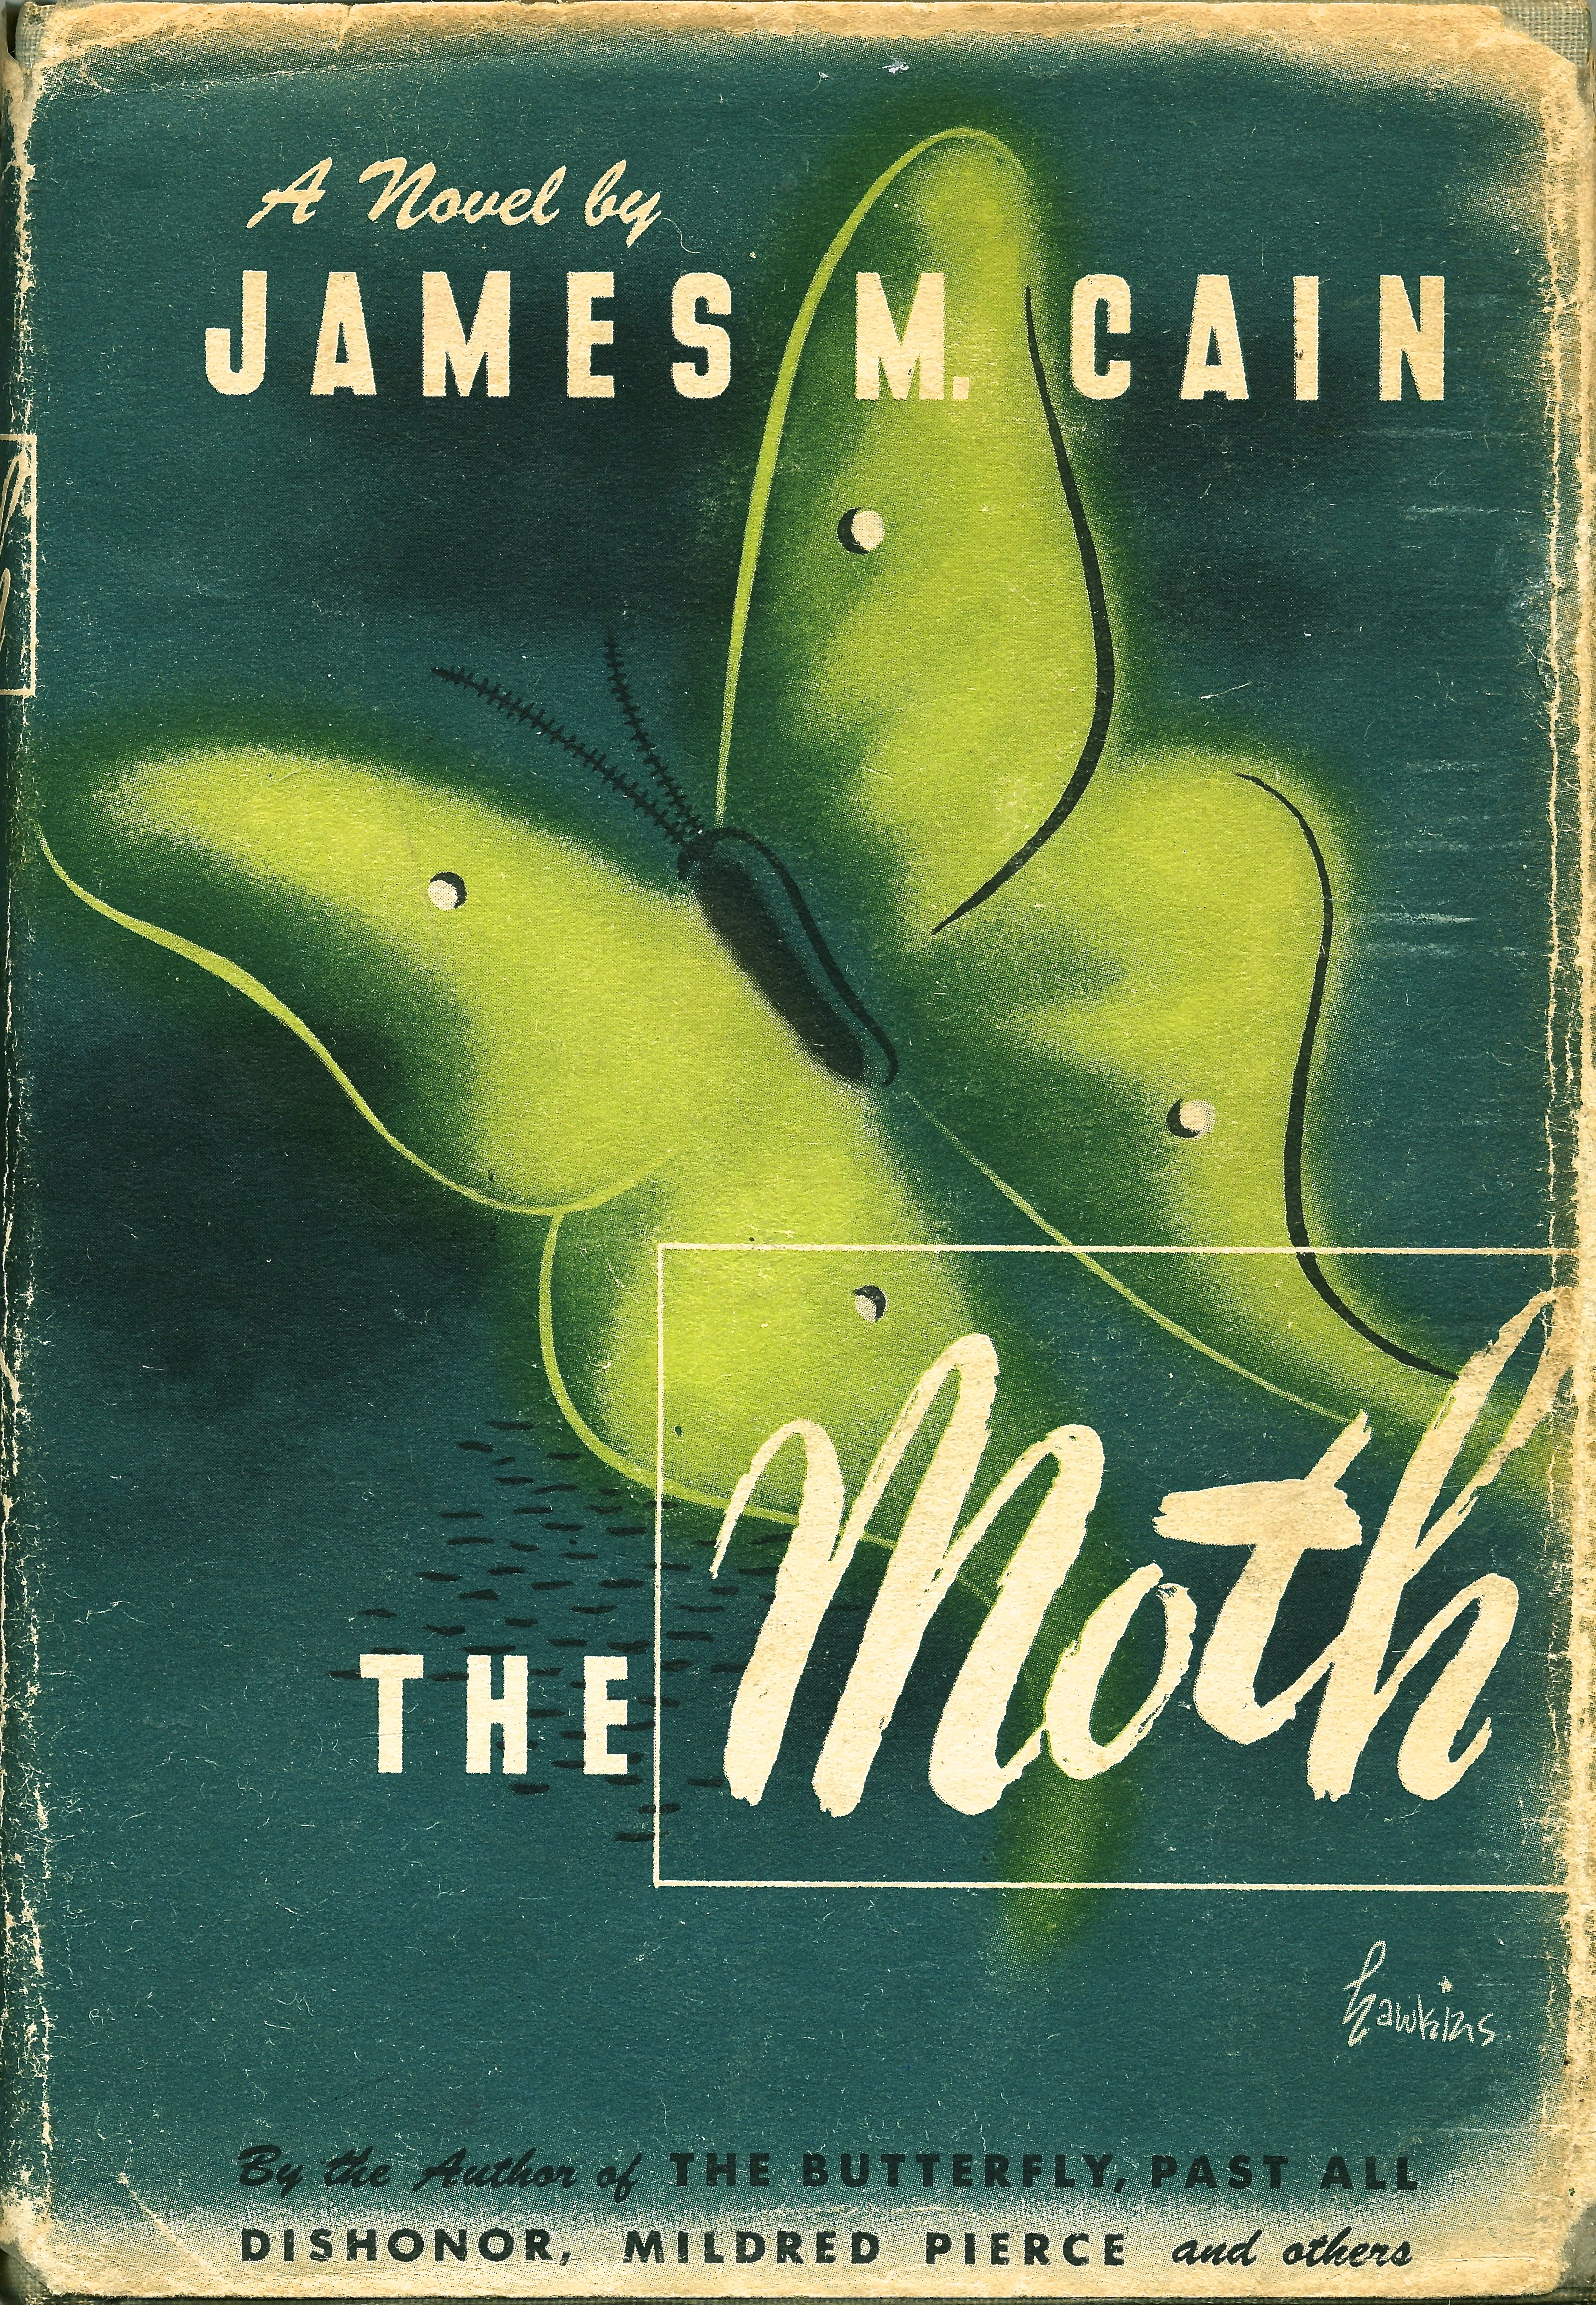 → The Moth | James M Cain 1948 | Book jacket by Arthur Hawkins Jr